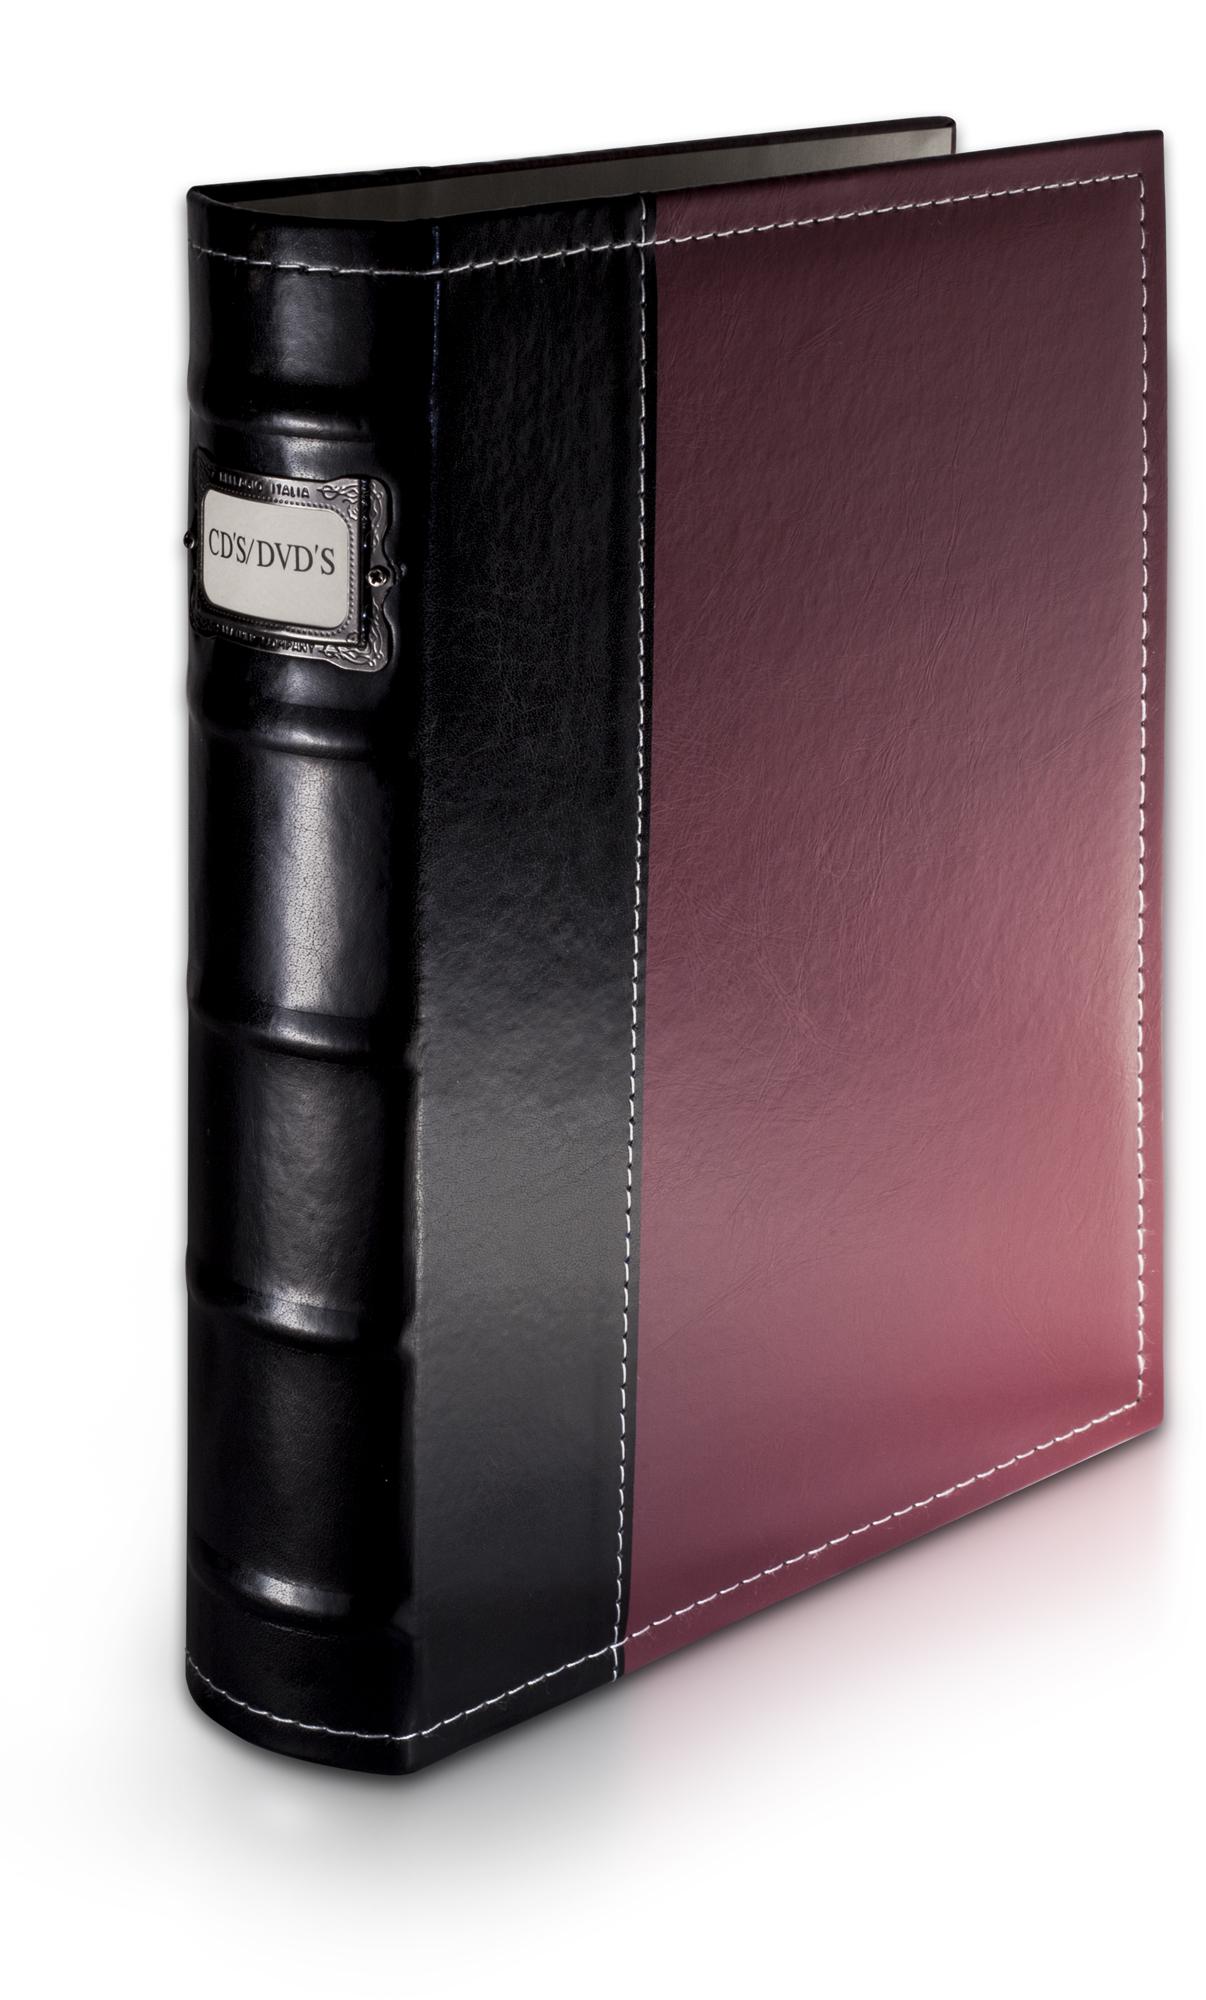 Bellagio Italia Burgundy Leather Cd Dvd Binder Holds 48